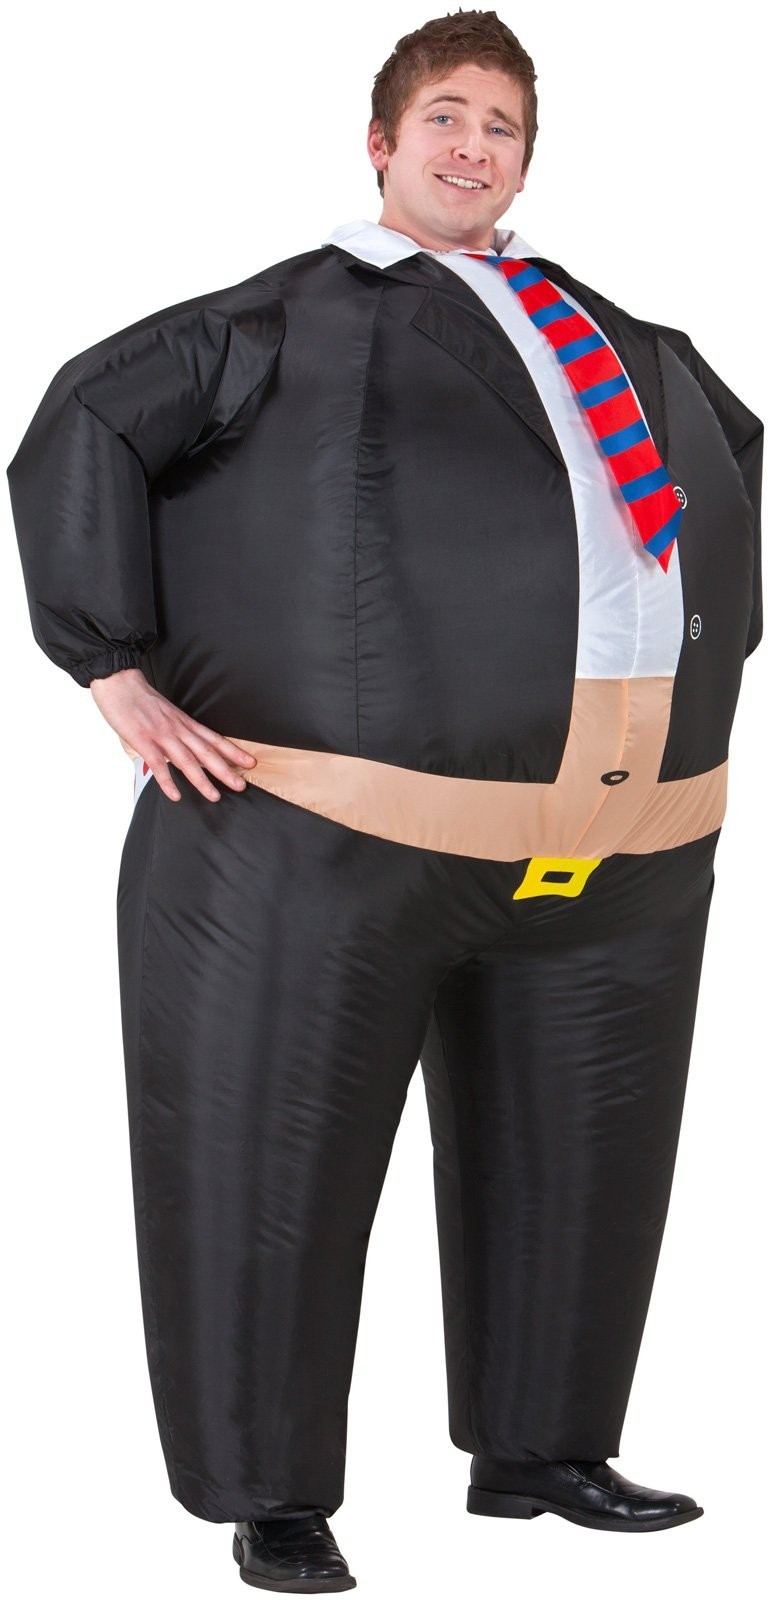 Надувной костюм Биг Босс (42) - Юмор, р.42